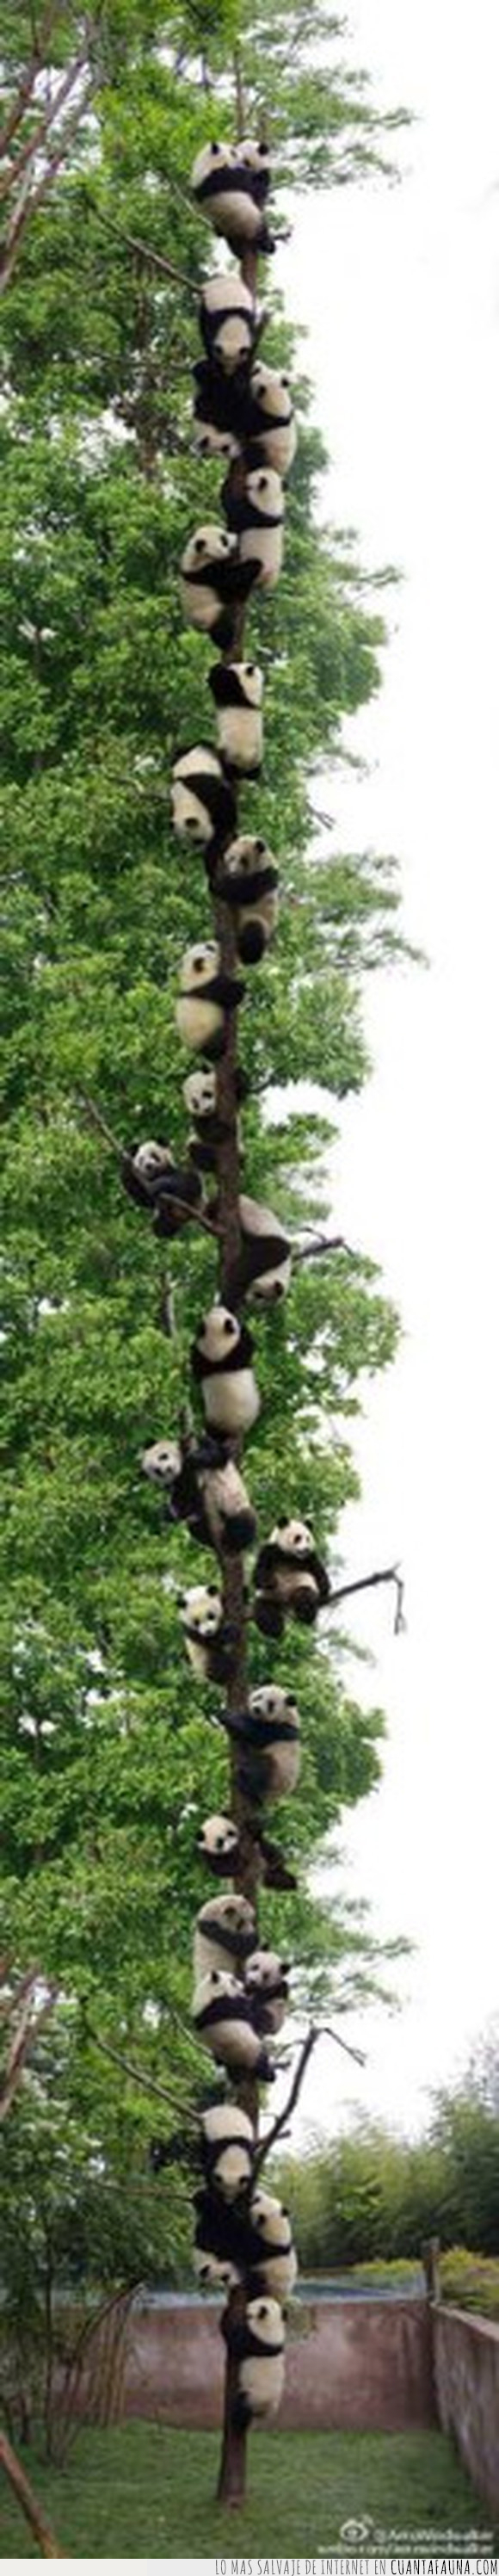 árbol,oso,panda,plantígrado